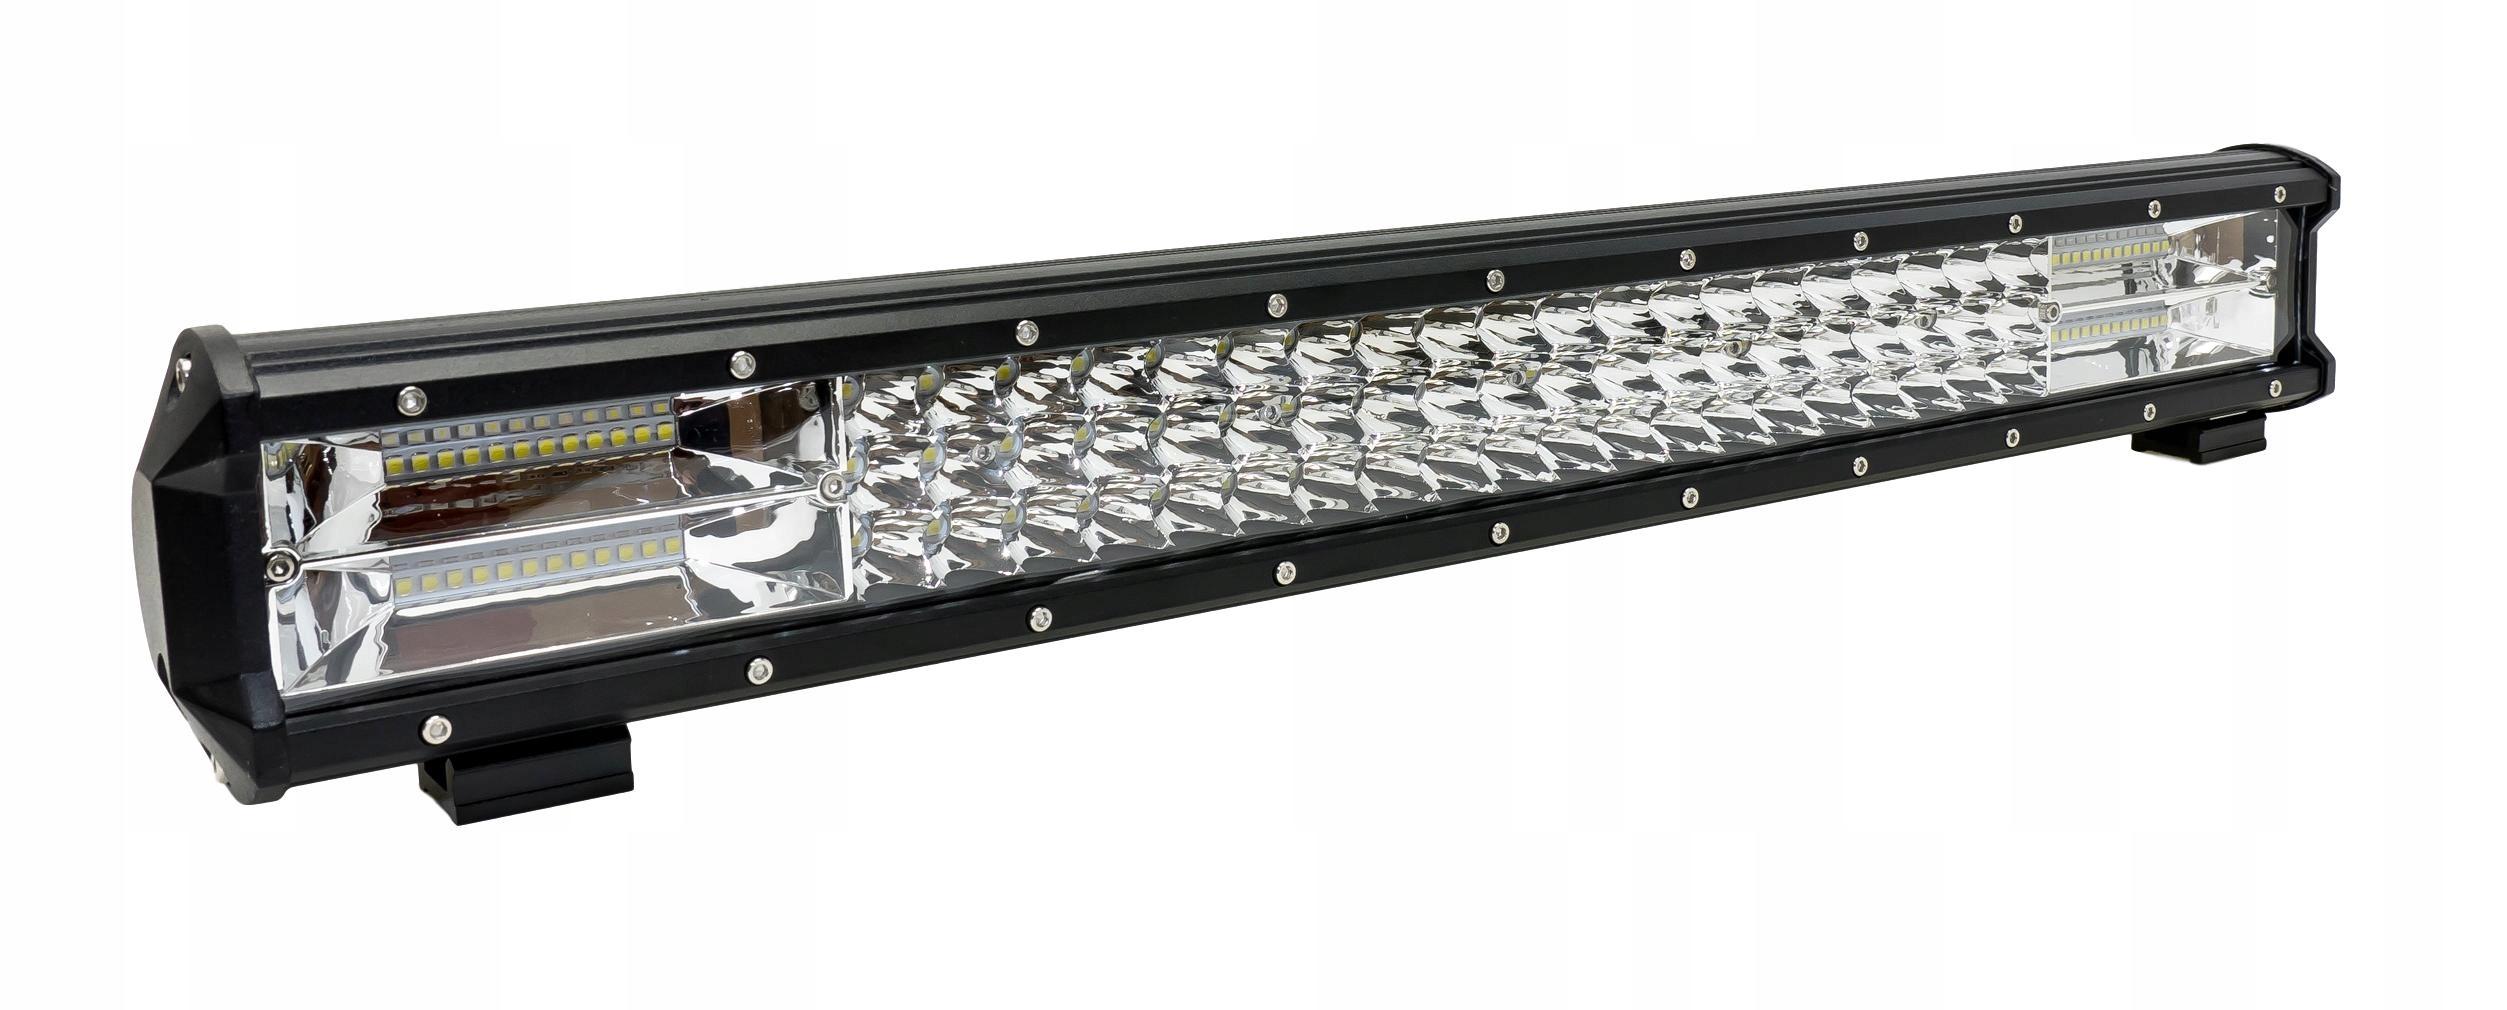 Lampa robocza halogen panel LED COMBO 324 W 59 cm